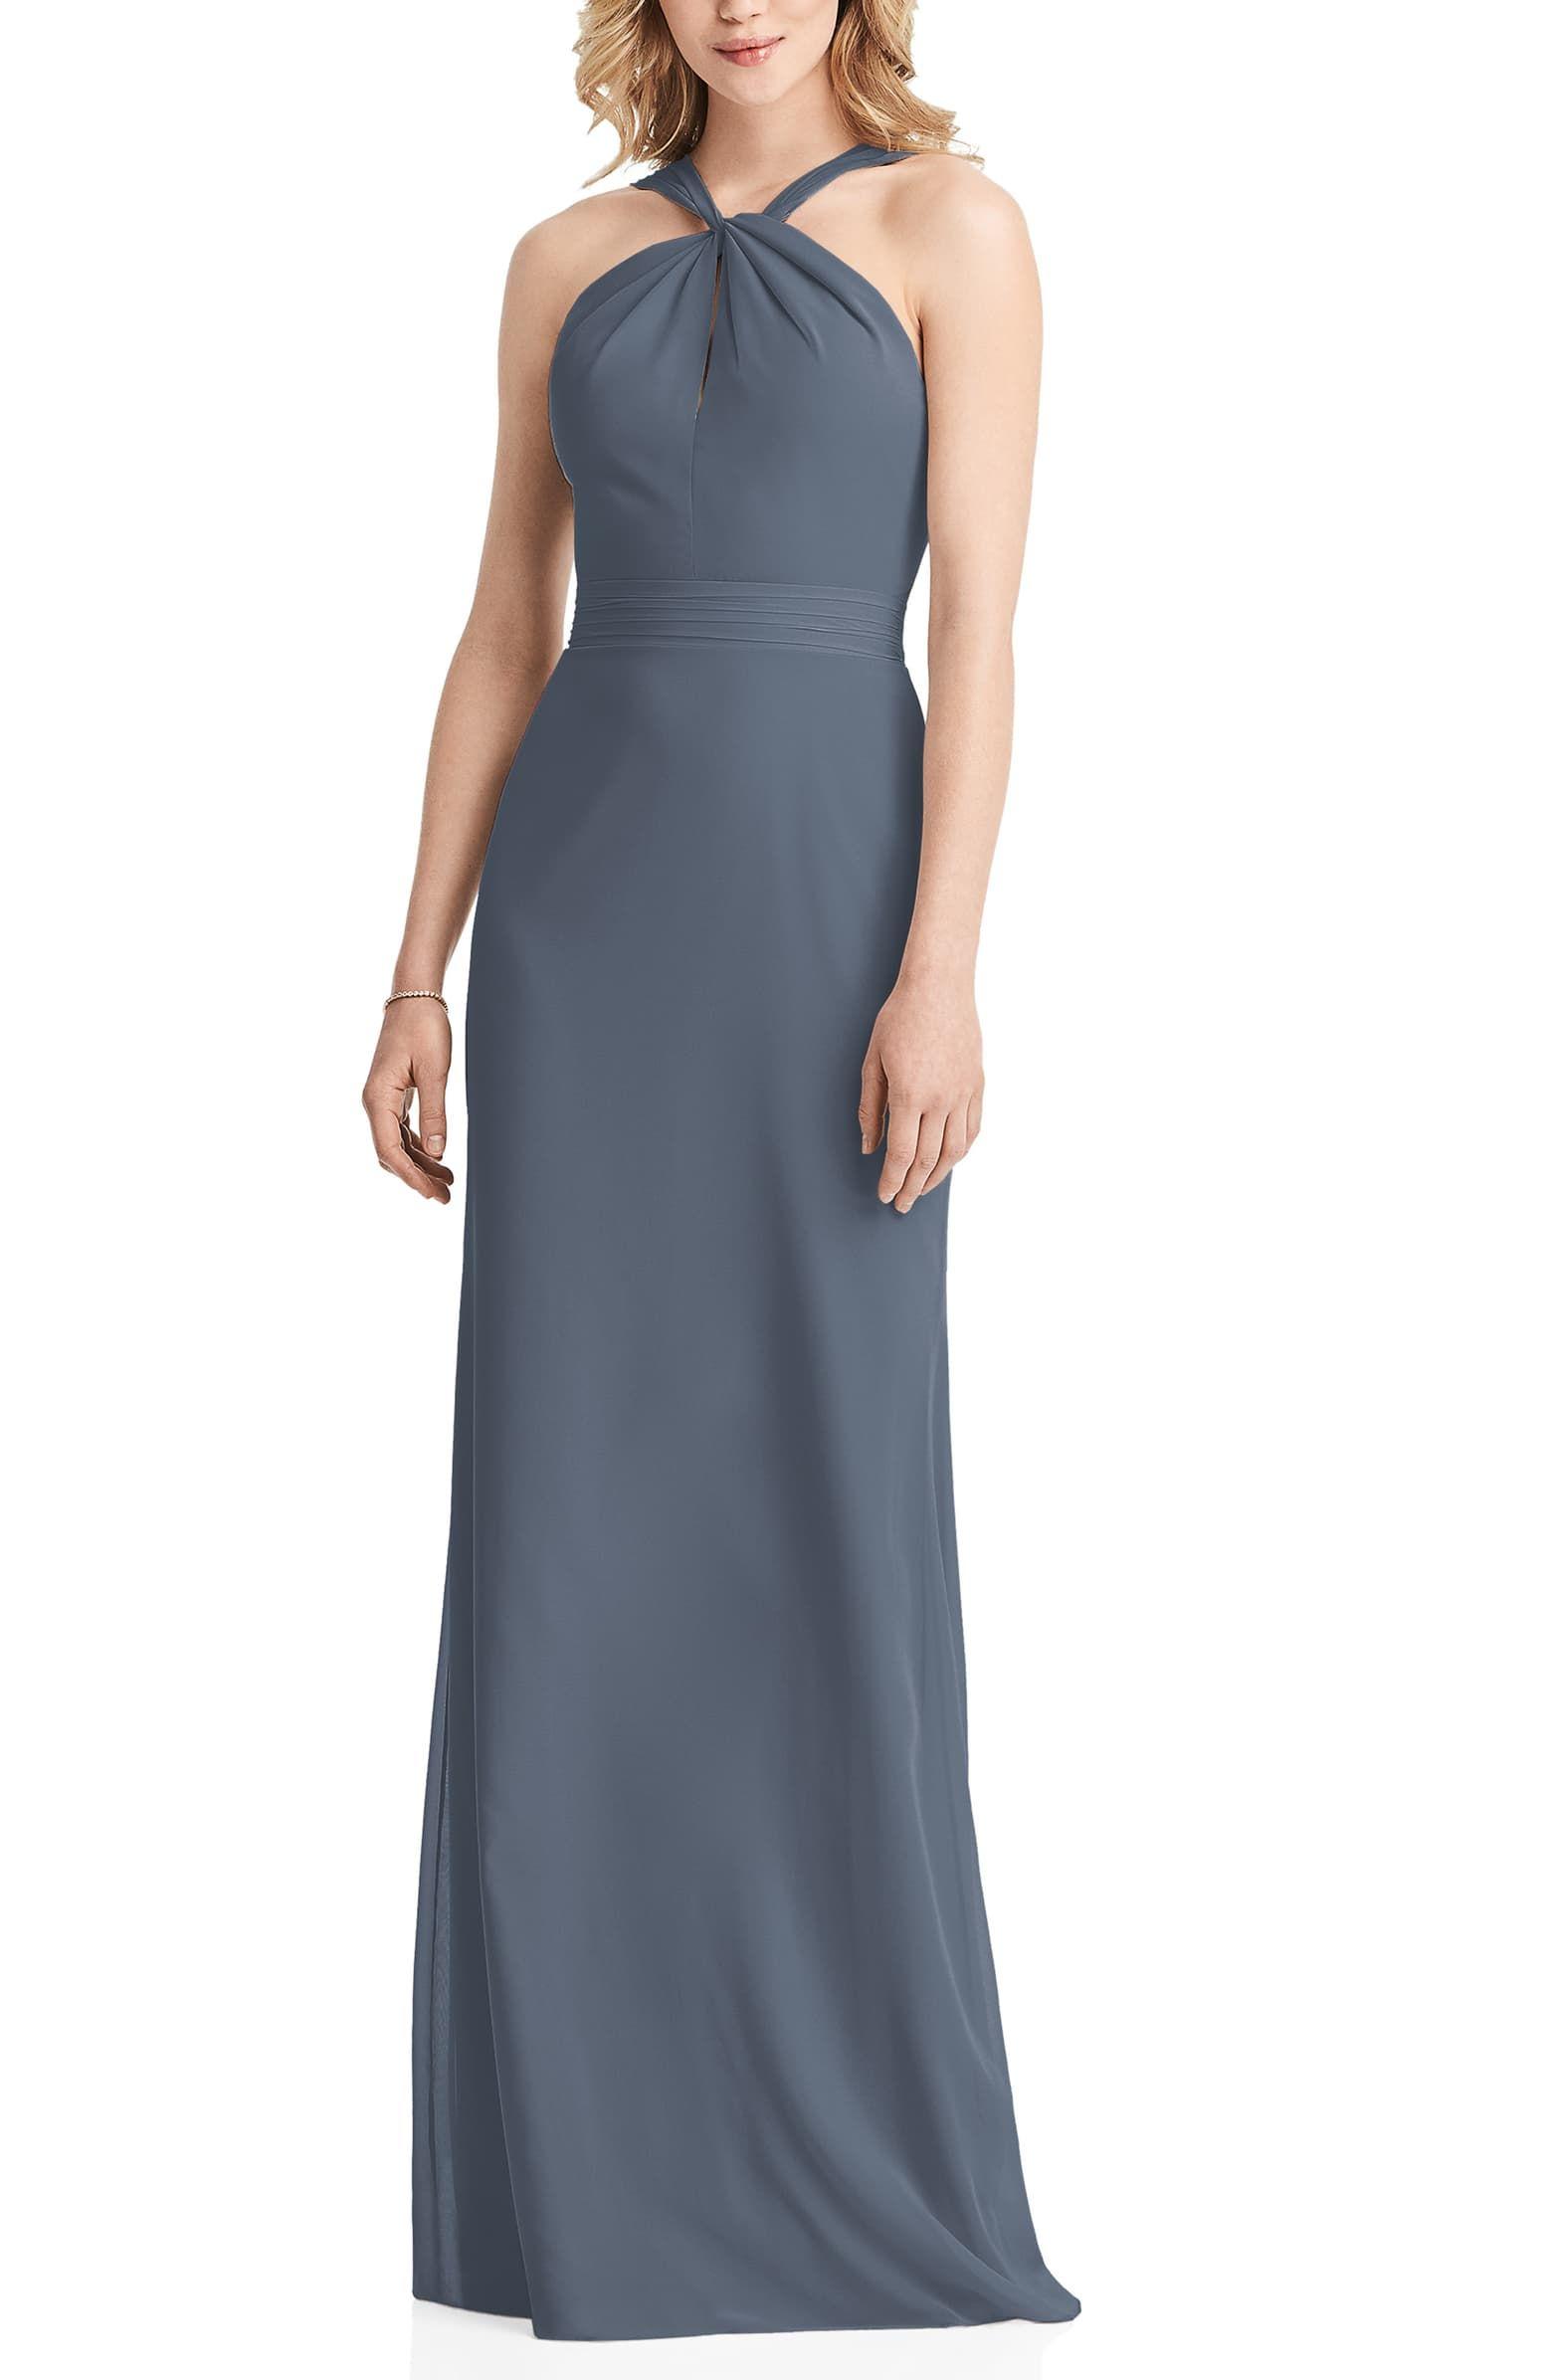 Pin On Bridesmaids Dresses [ 2392 x 1560 Pixel ]